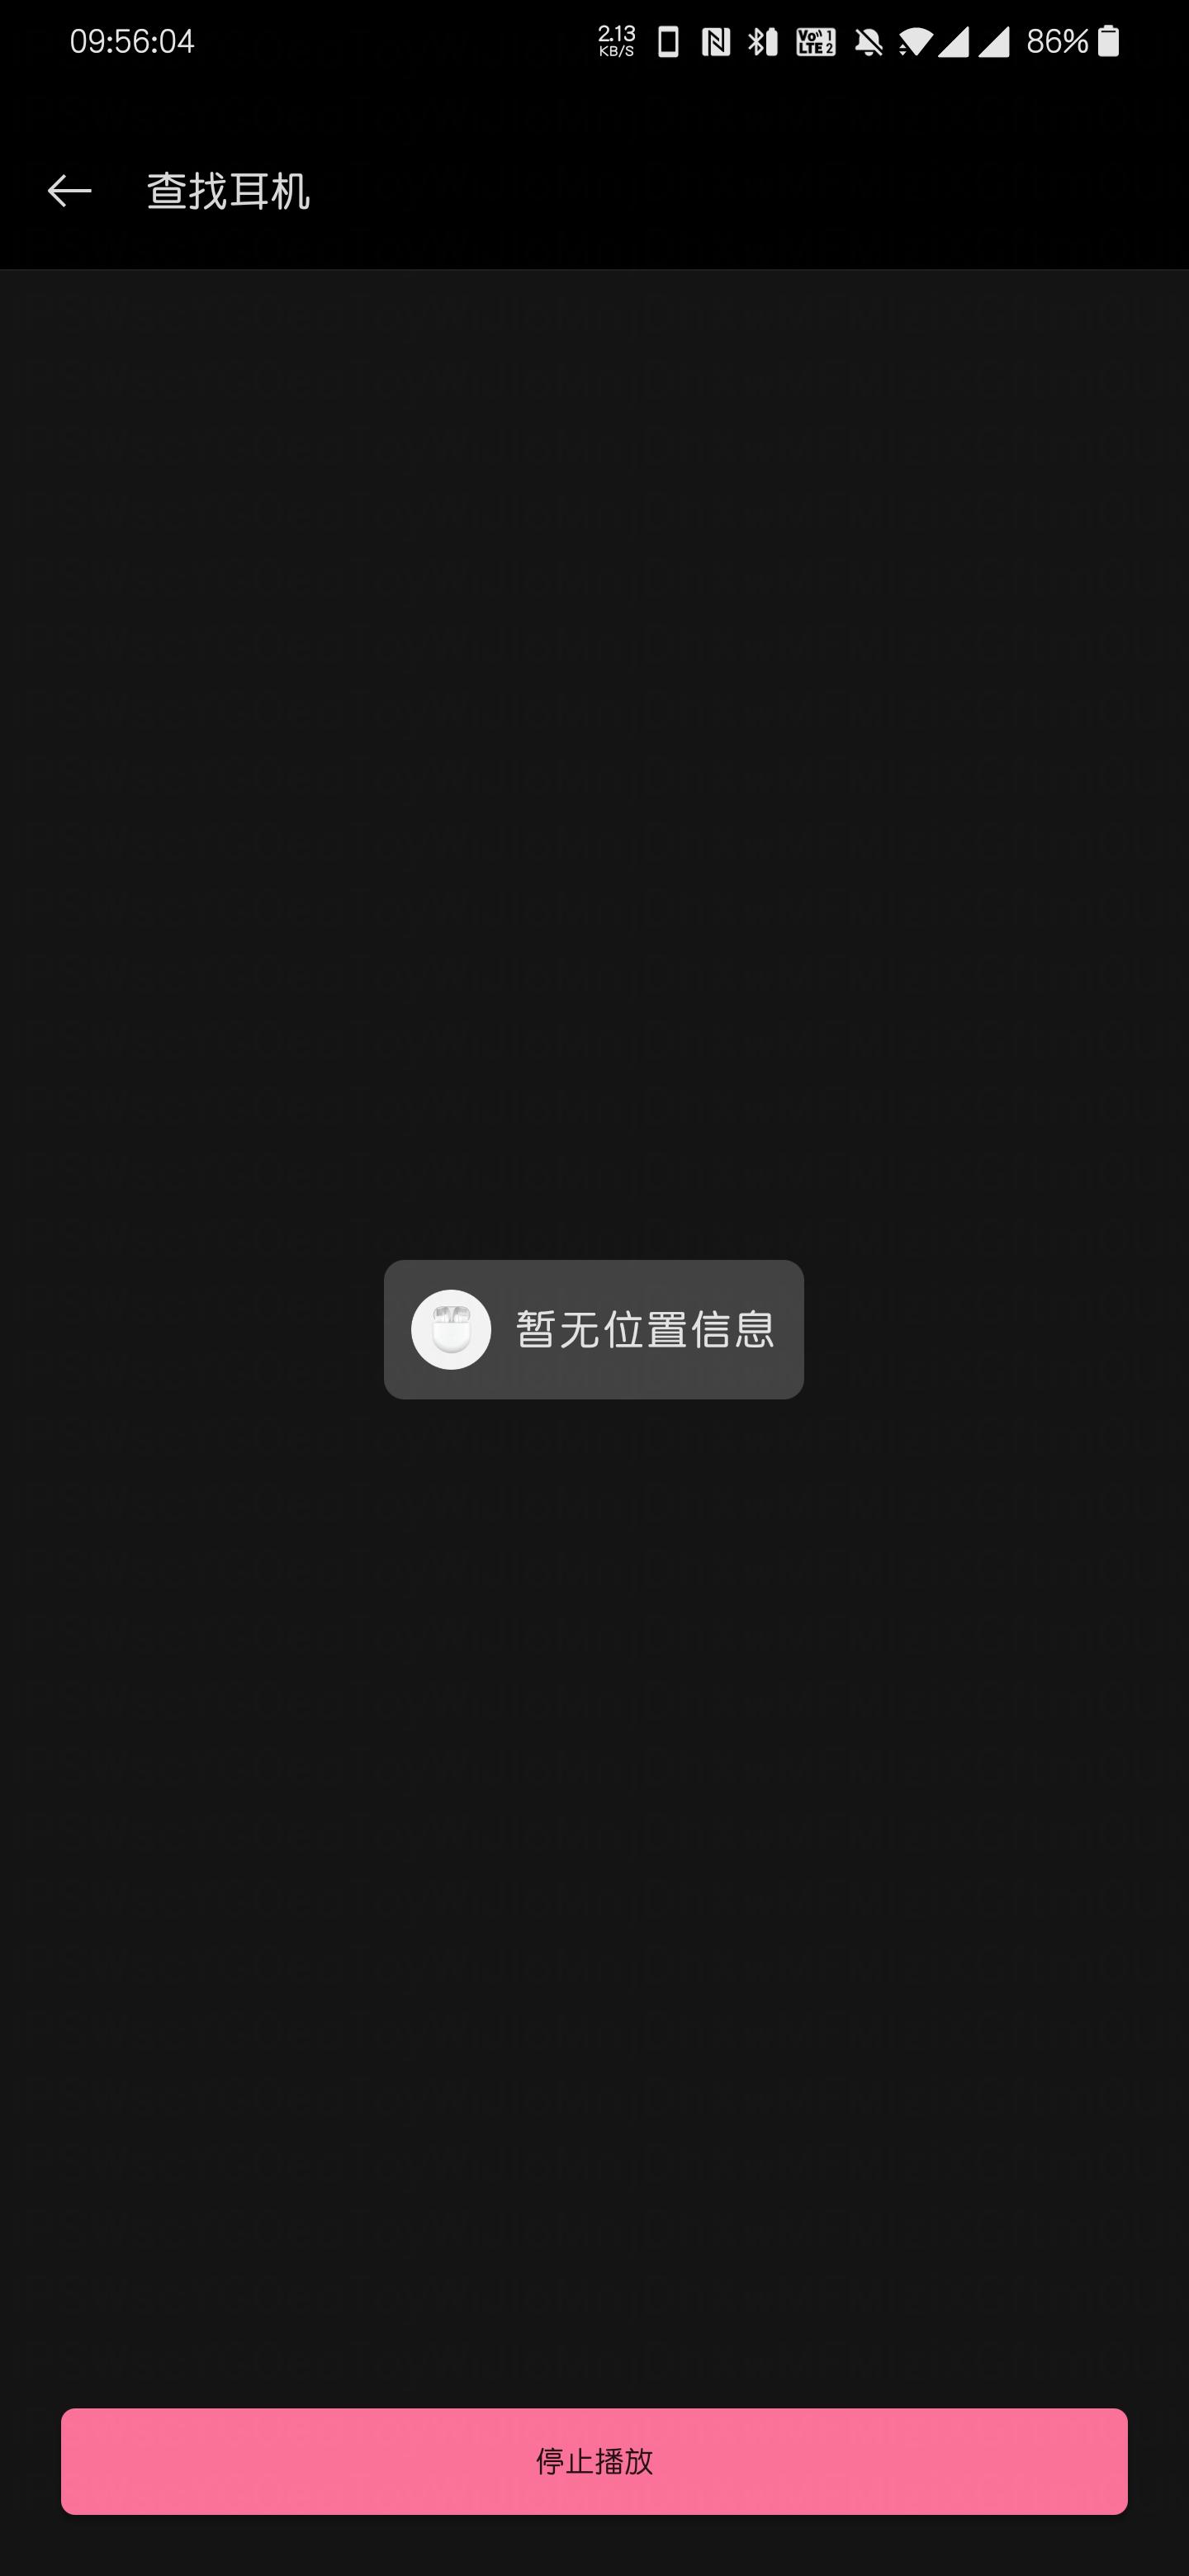 Screenshot_20200806-095605.png